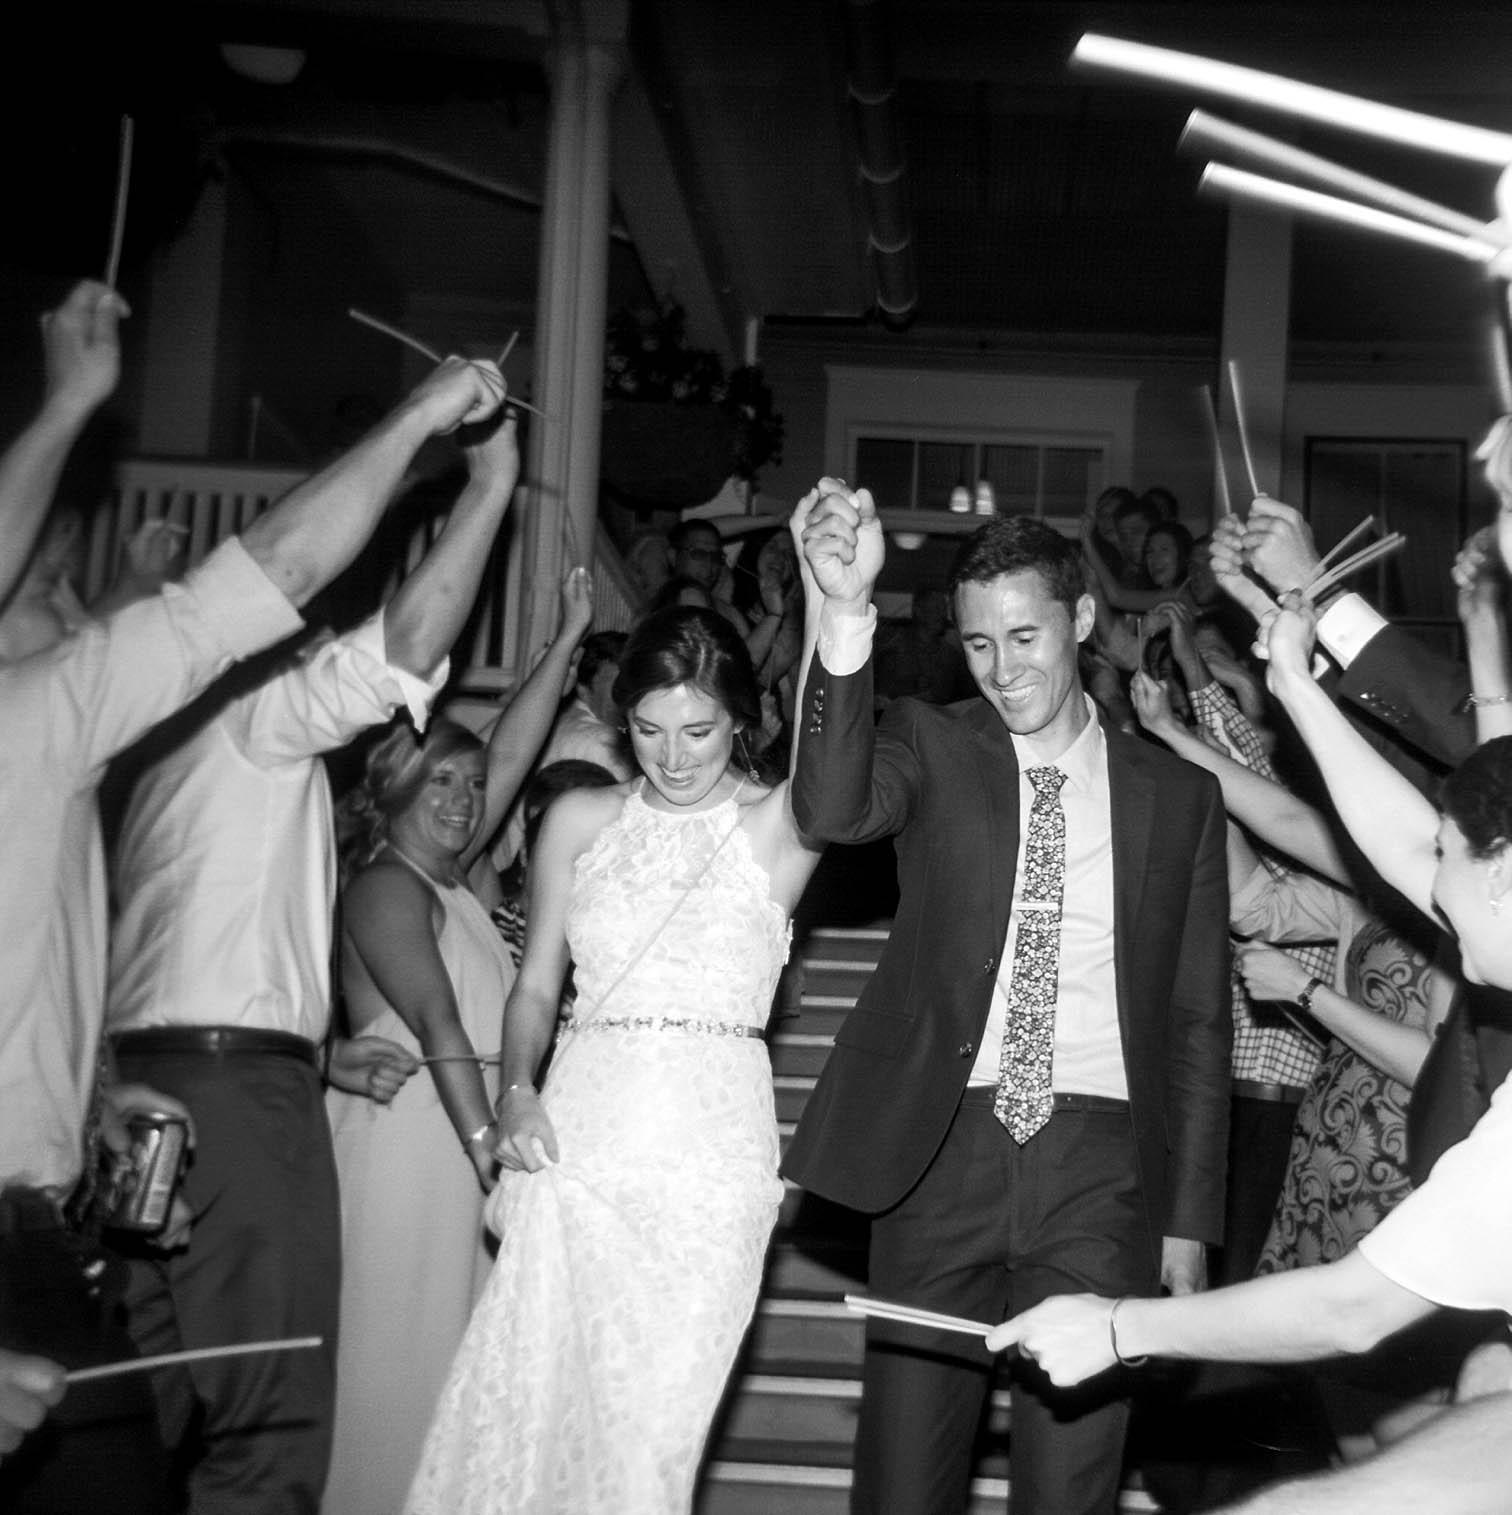 Chautauqua Dining Hall Wedding, Holga Wedding Photos, Outdoor Wedding Details, Colorado Mountain Weddings, Danielle DeFiore Photographer, Destination Wedding Photographers, Weddings in Boulder Colorado, Outdoor Ceremony, Film Photographer, Summer Weddings, Bride And Groom Wedding Exits